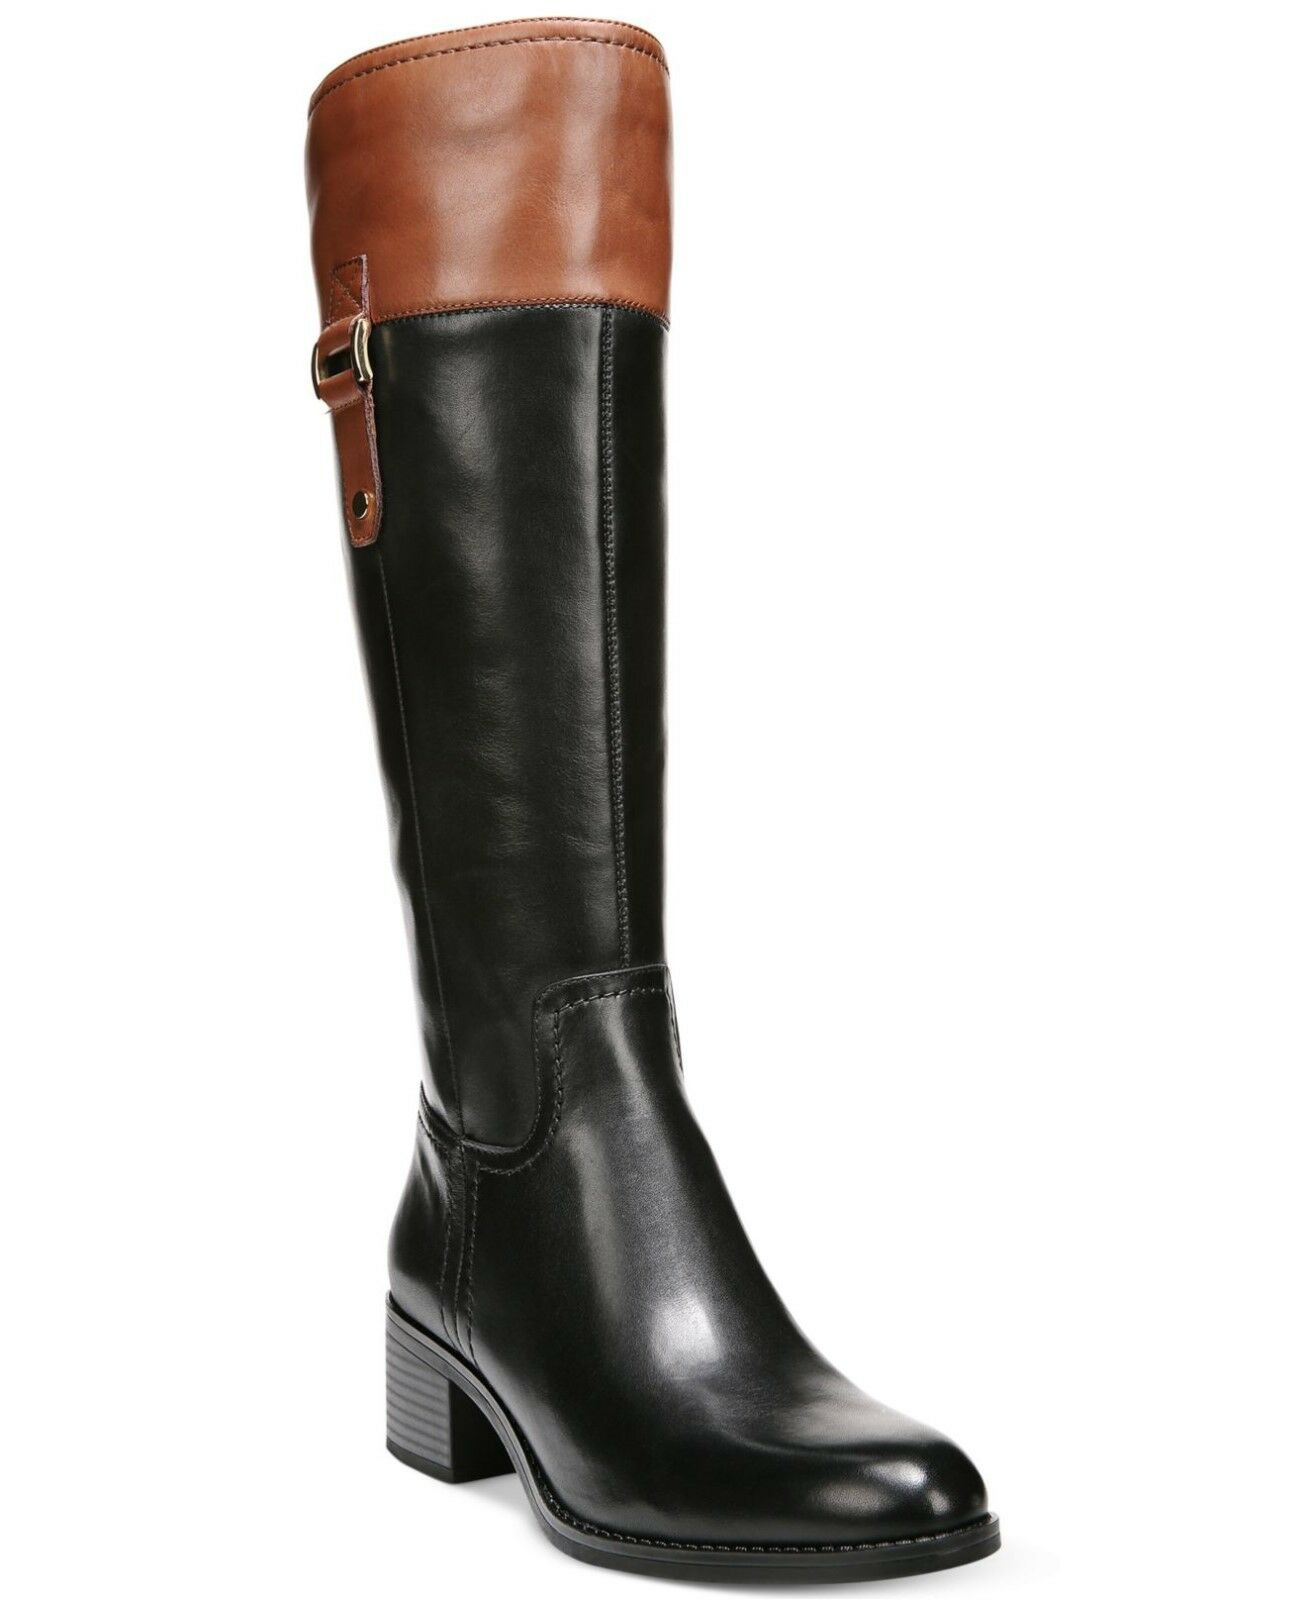 Brand New Franco Sarto Women's Lizbeth Wide calf Leather knee Boot Sz 6.5US,36.5